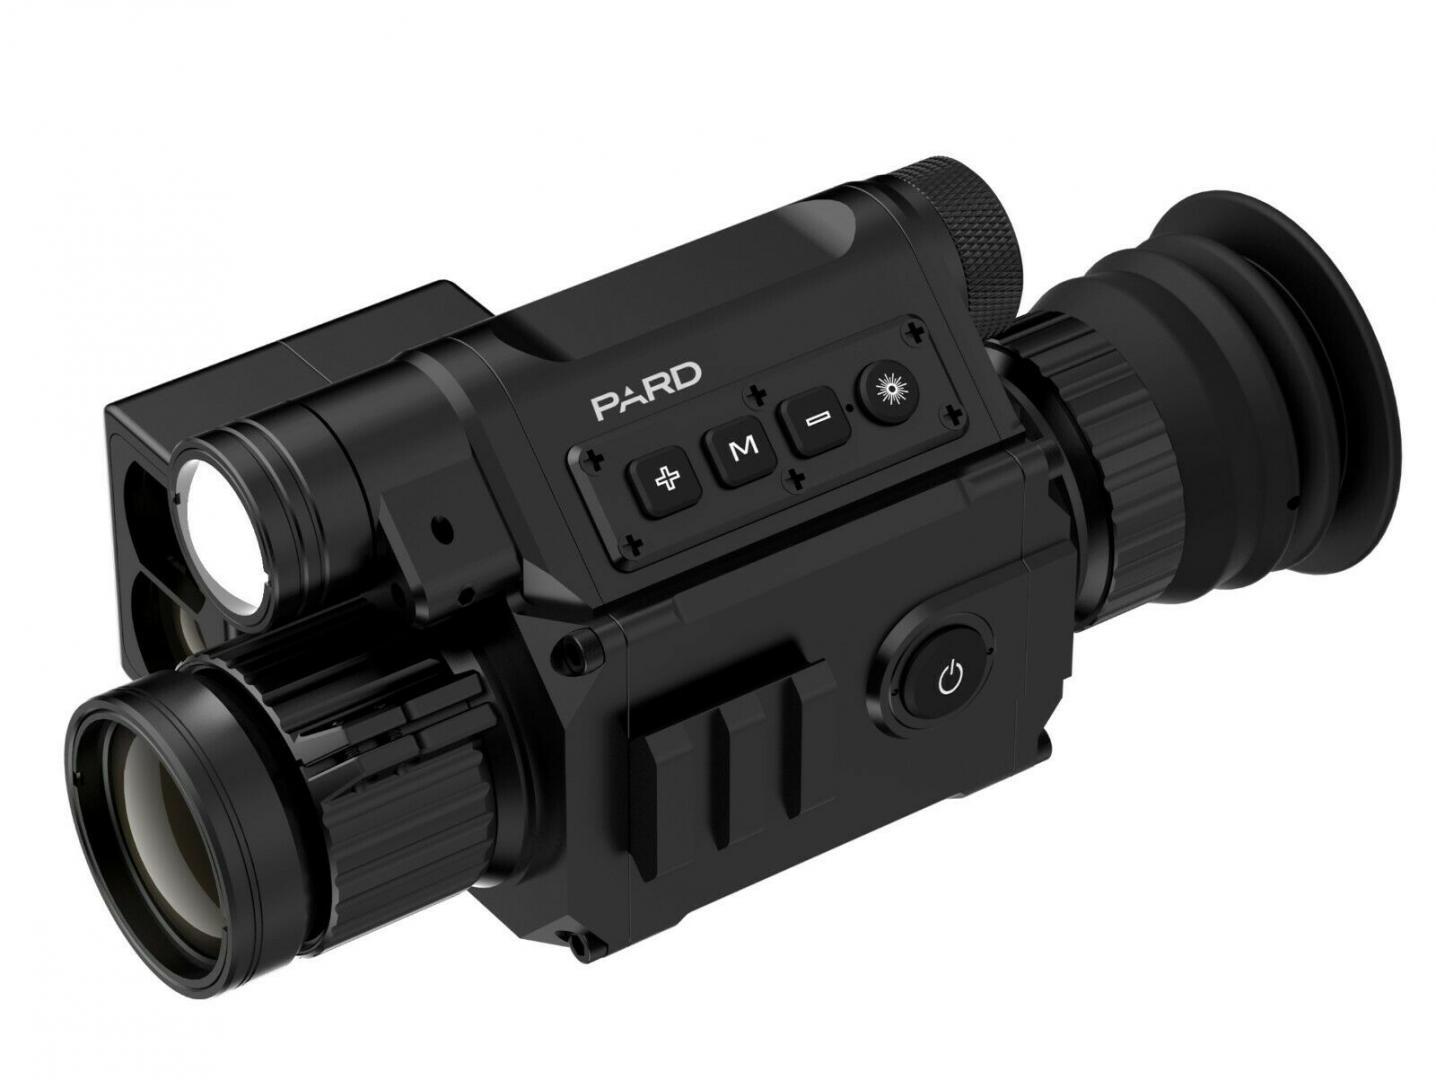 Pard Nv008 Lrf Night Vision Scope